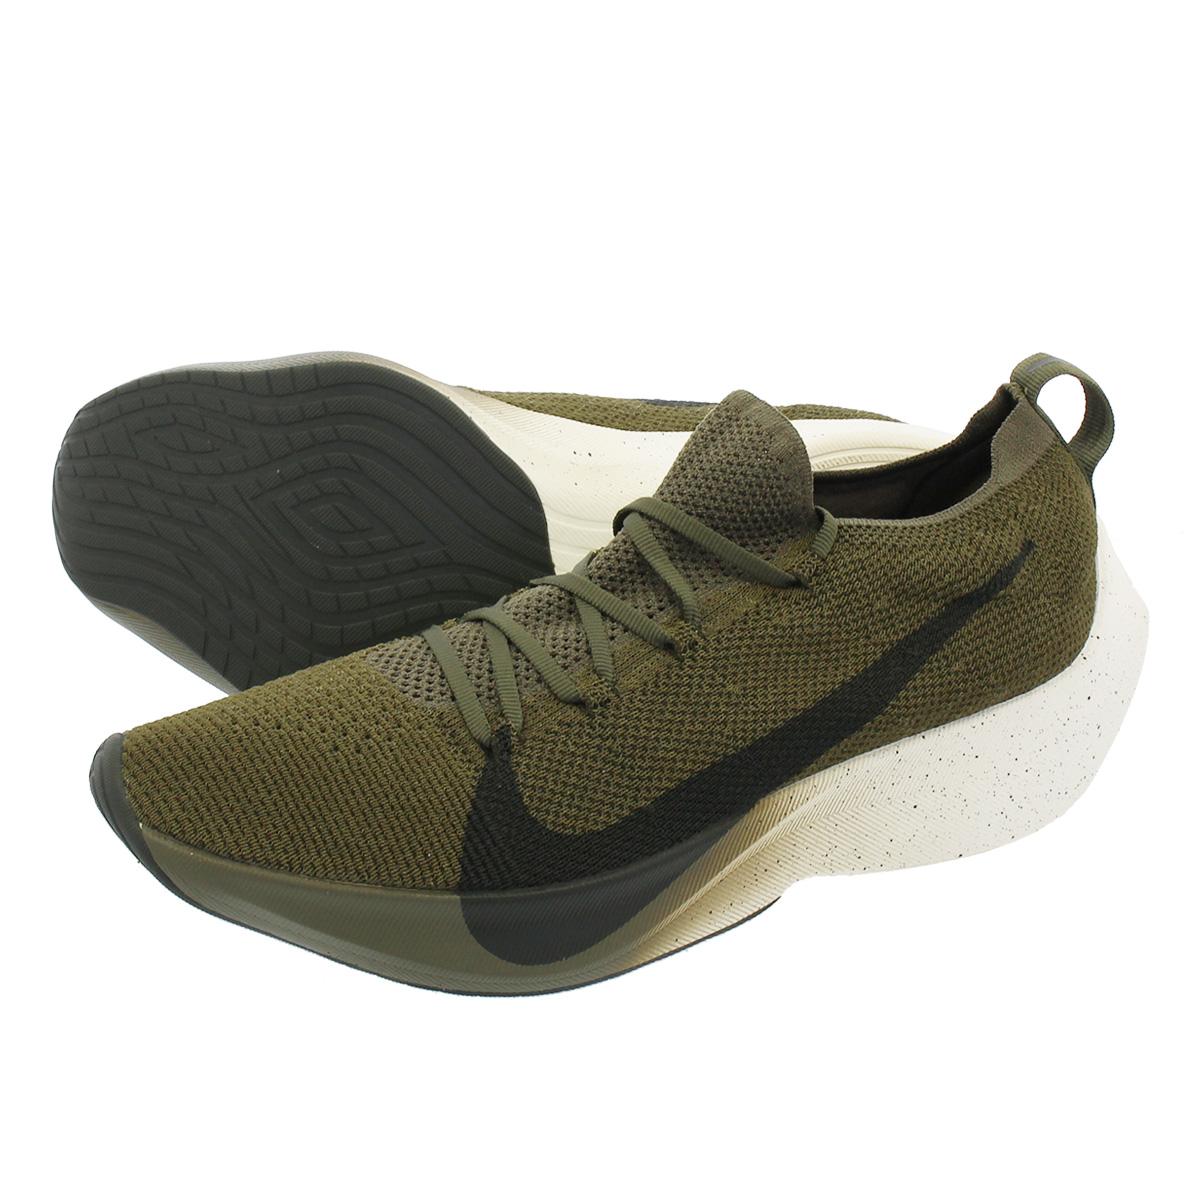 5ce83adaf2 NIKE VAPOR STREET FLYKNIT Nike vapor street fried food knit MEDIUM OLIVE/SEQUOIA/SAIL  ...